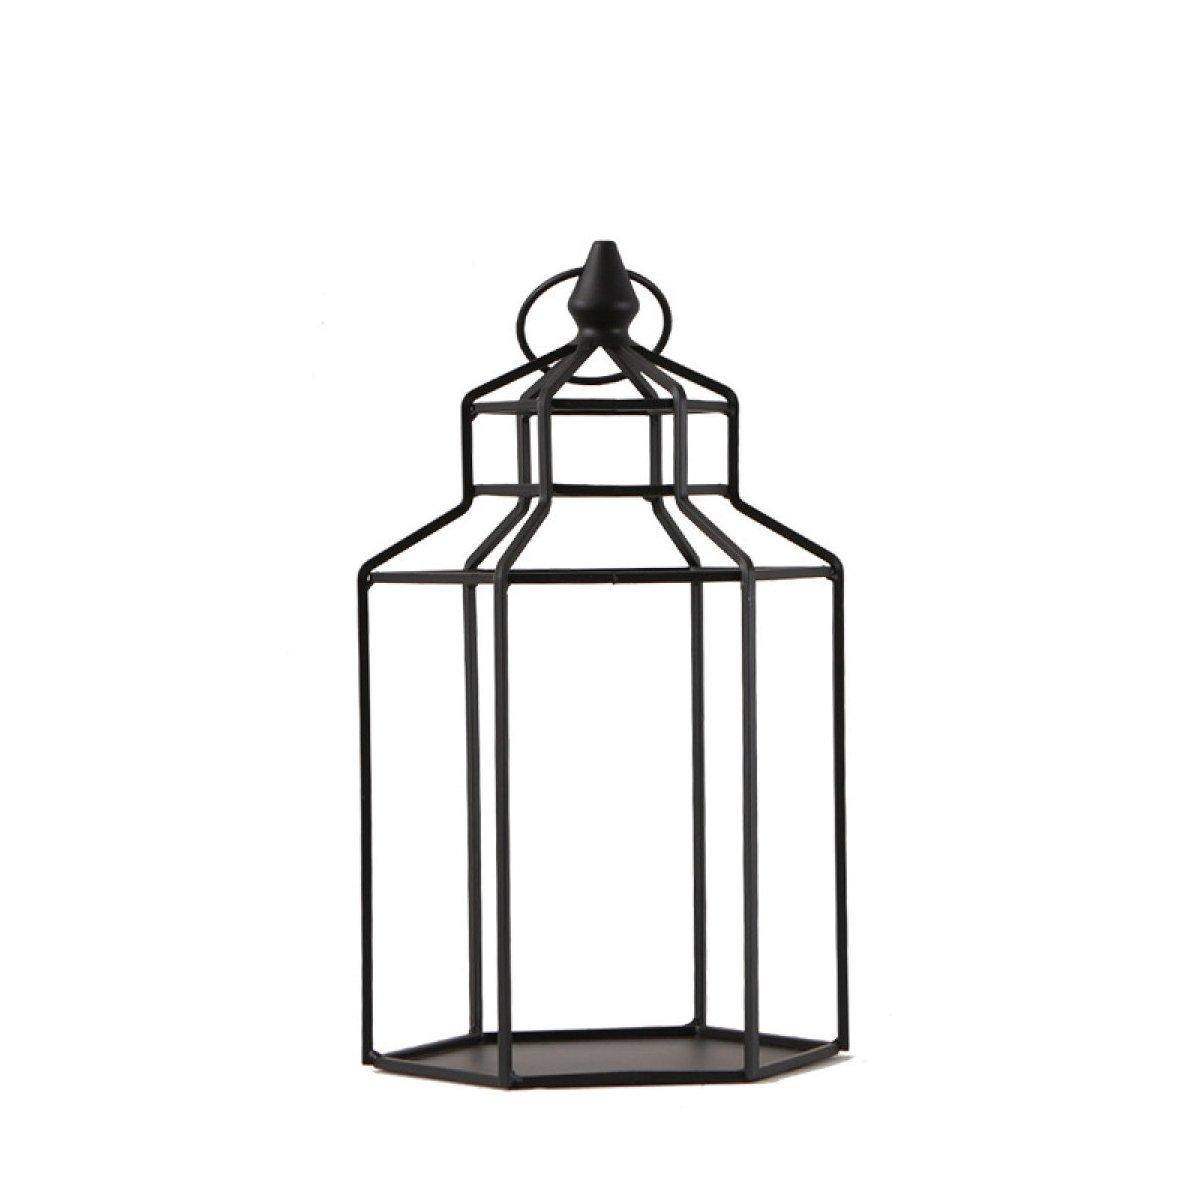 L;IAN Flower Pot Rack Simple Iron Art Drop-Floor Shelf Living Room Decorative Candles line Lights Flower Stand